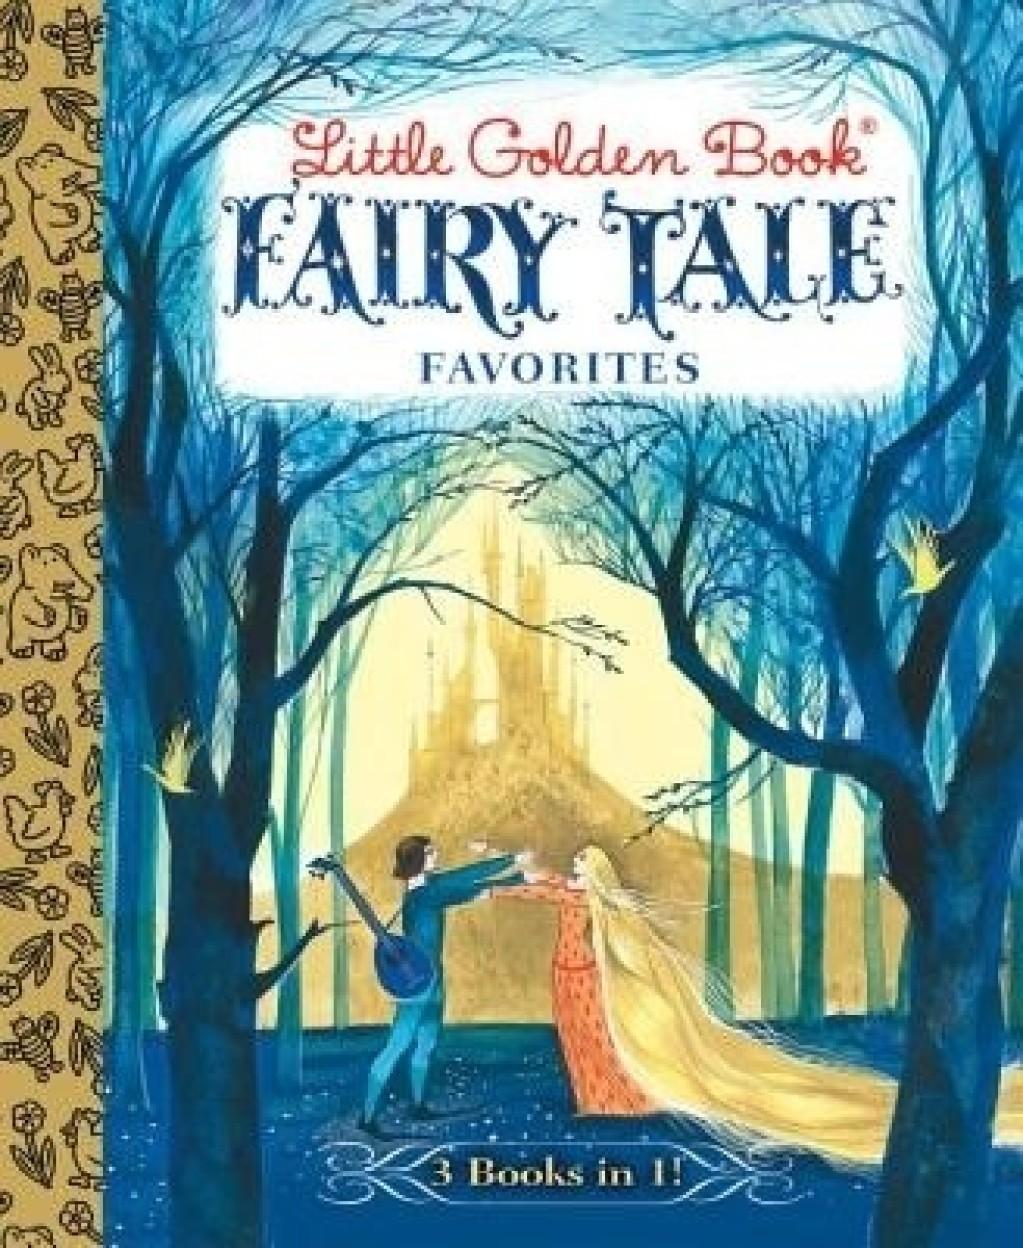 Little Golden Book Fairy Tale Favorites (Little Golden Book Favorites) by Brothers Grimm,Hans Christian Andersen